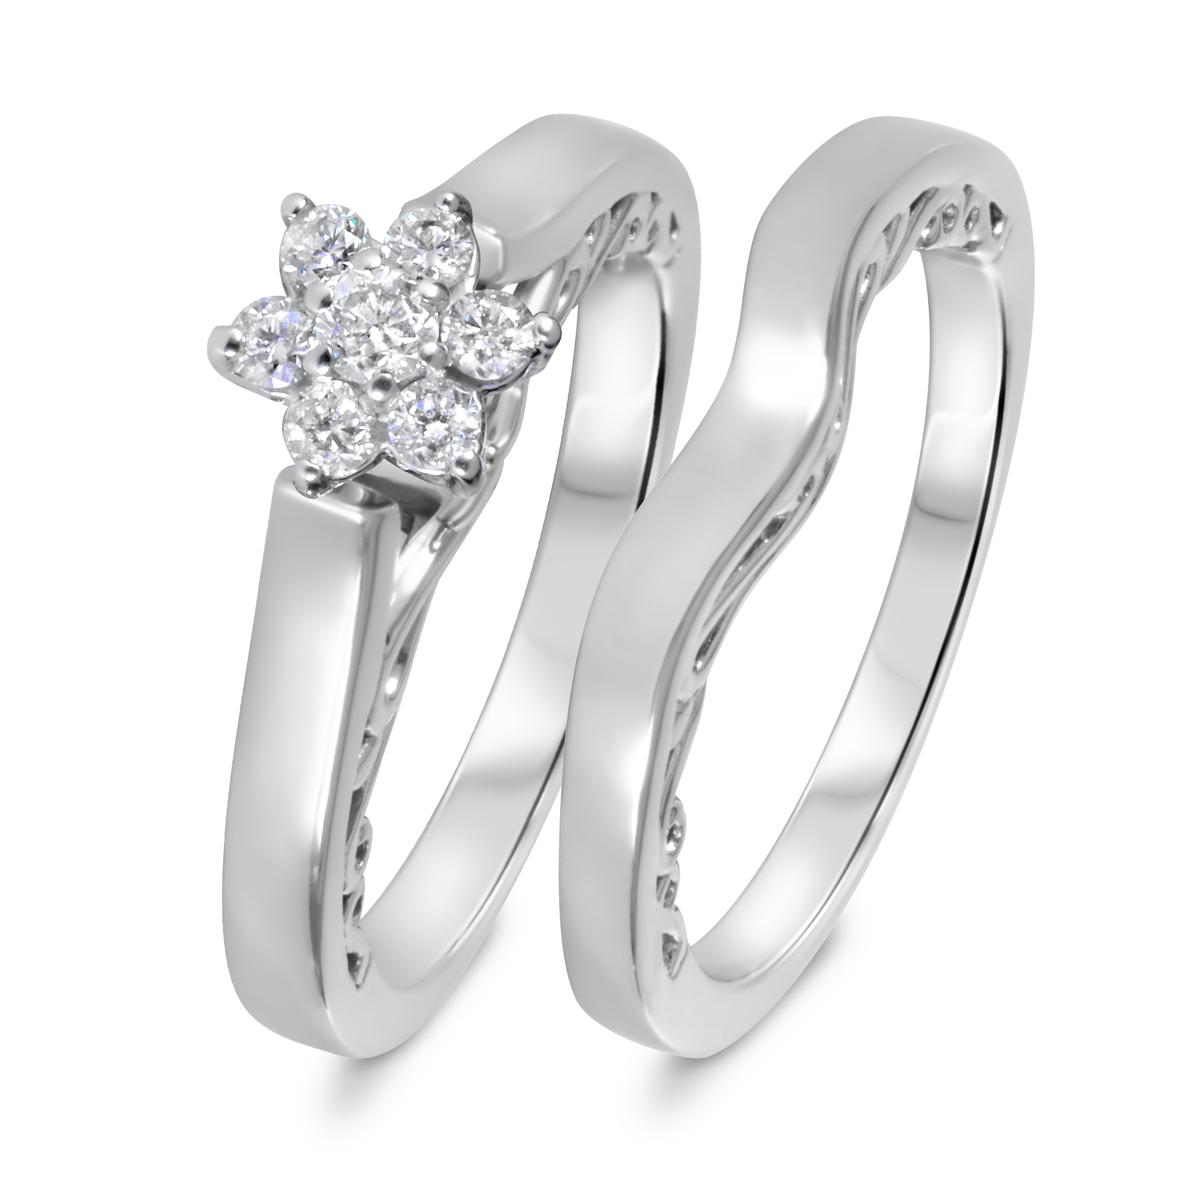 1/4 CT. T.W. Diamond Women's Bridal Wedding Ring Set 14K White Gold